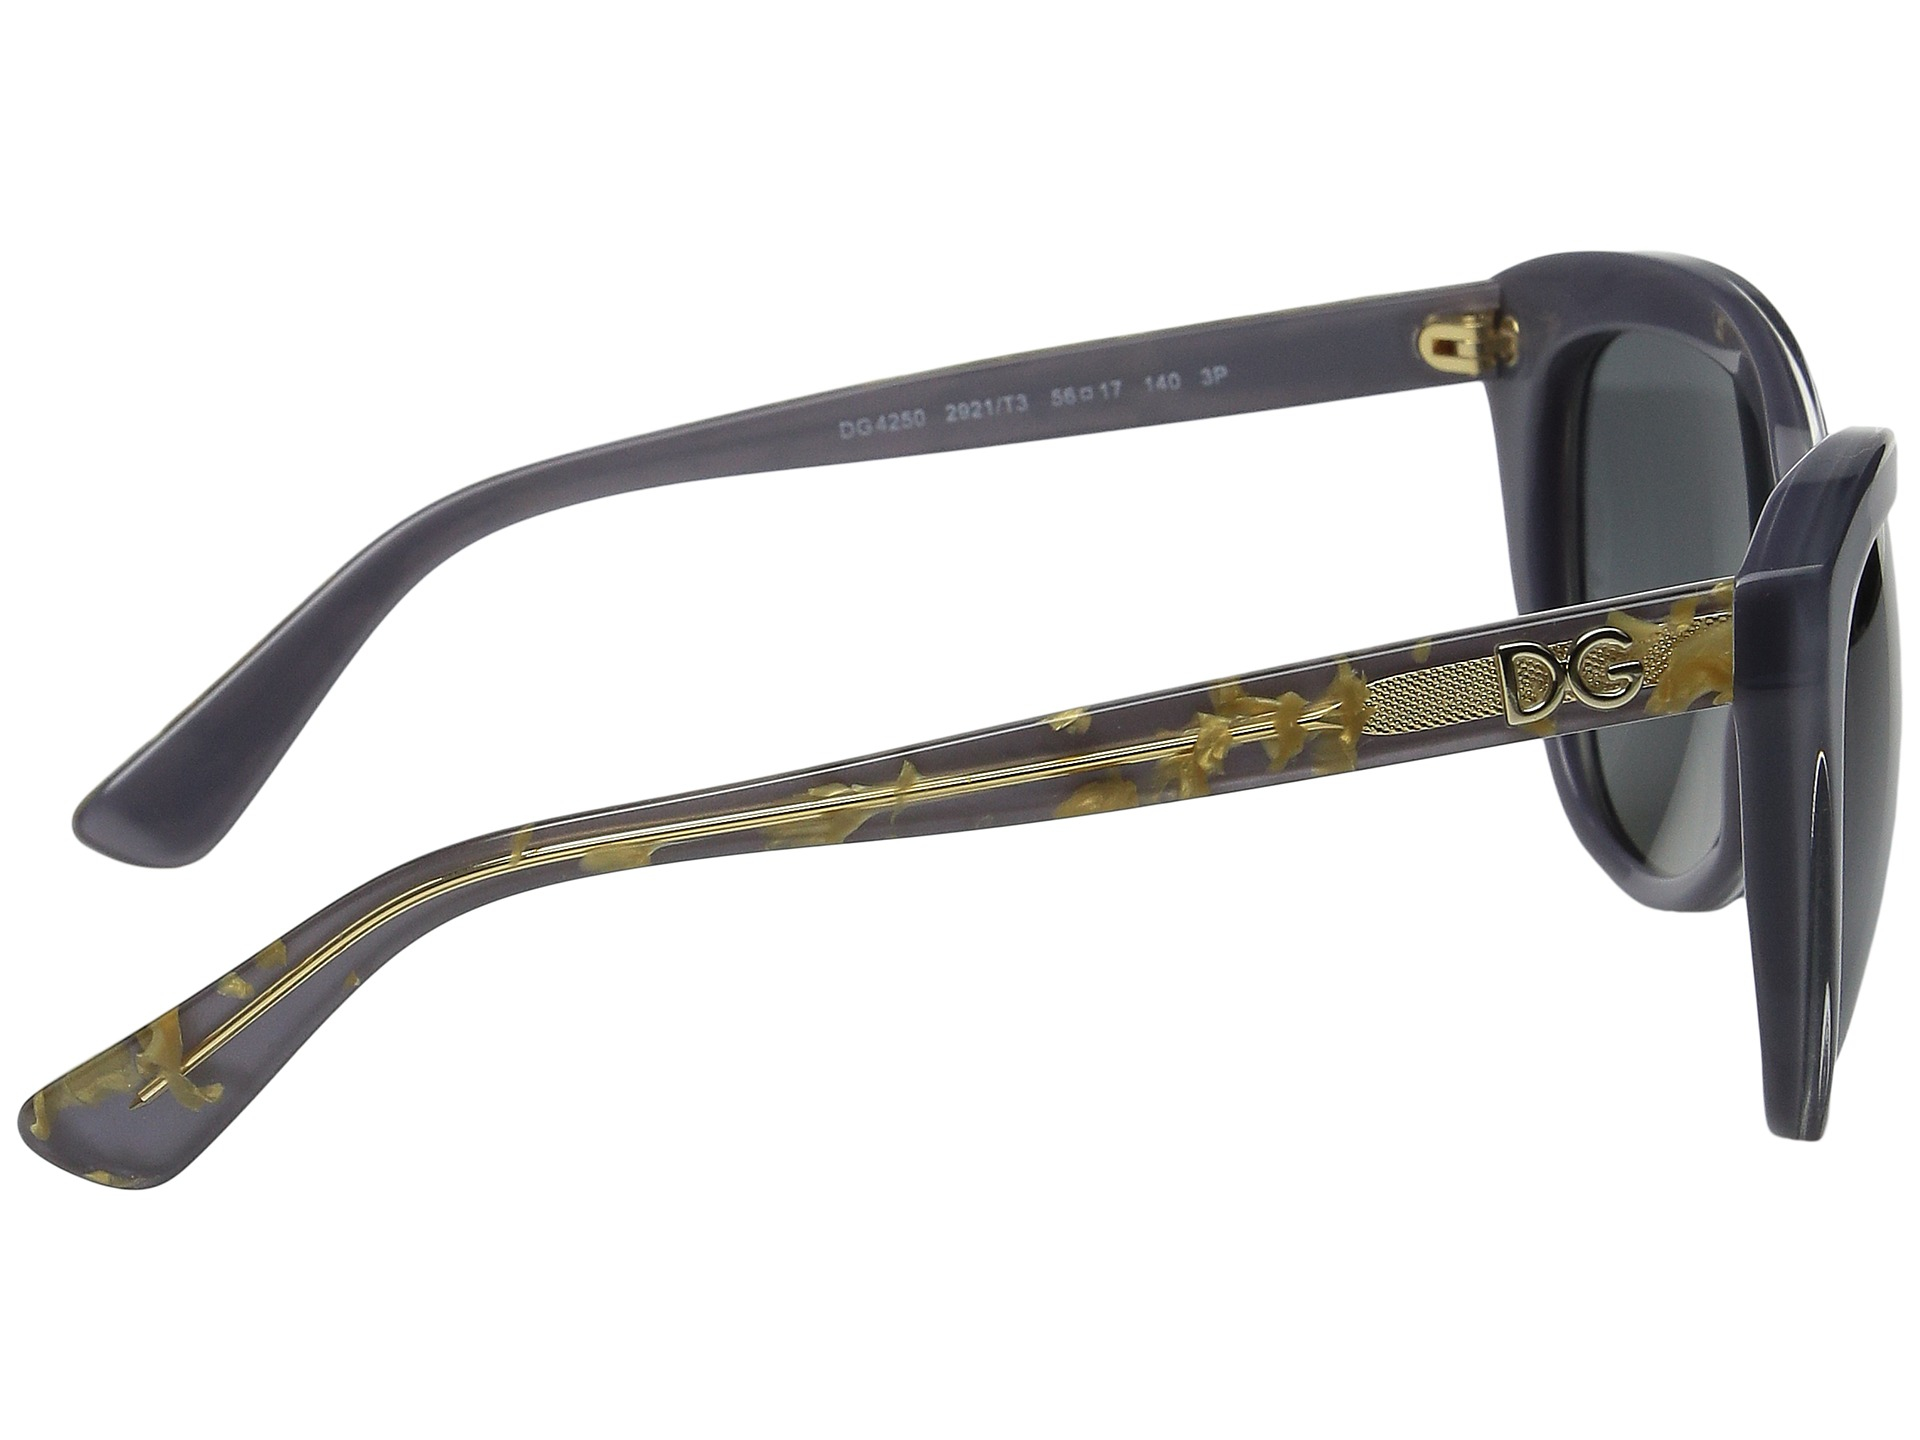 83c18b7eb467 Lyst - Dolce   Gabbana Dg4250 in Gray